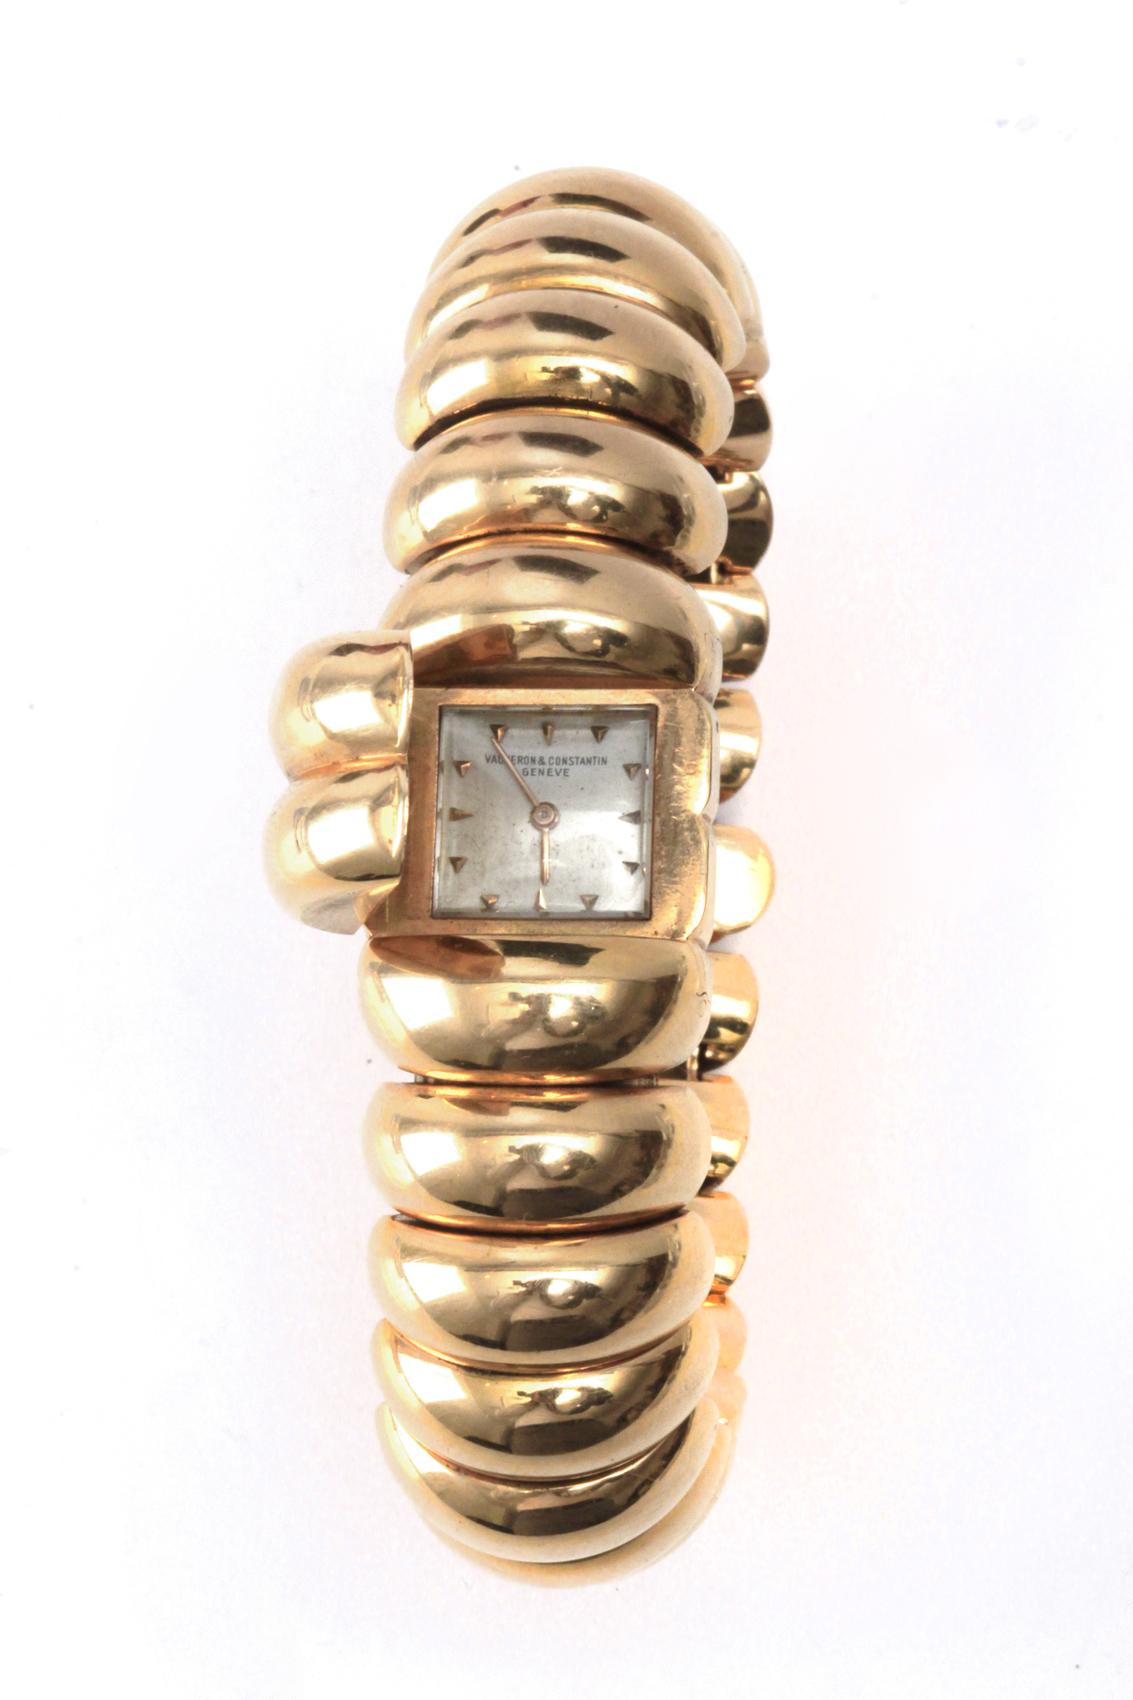 Lot 86 - Vacheron Constantin. An 18 k. yellow gold bangle watch